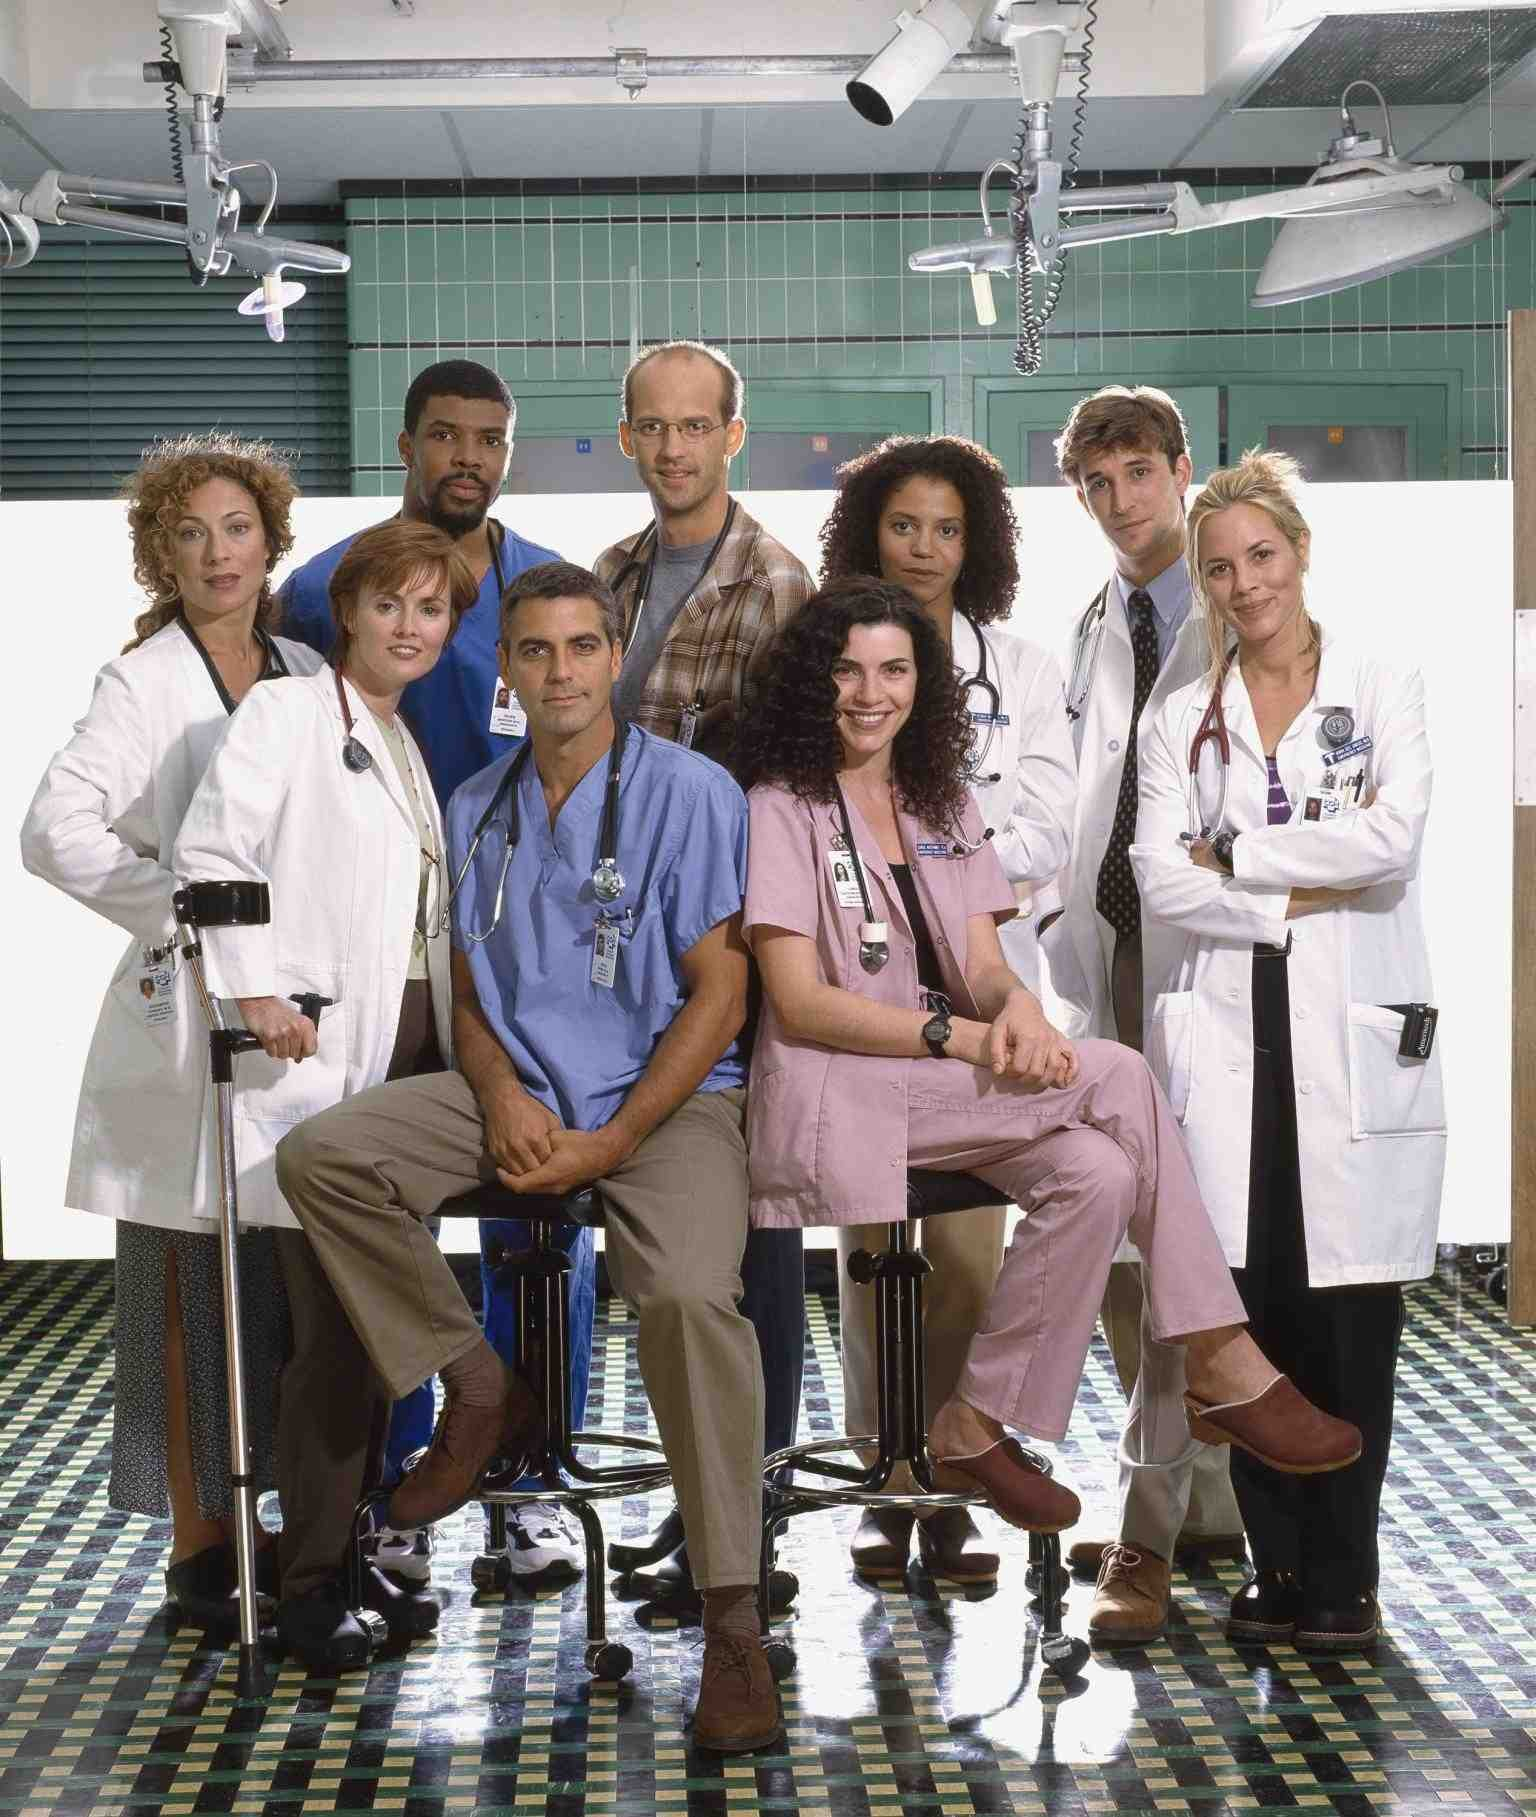 「ER緊急救命室 ドラマ」の画像検索結果